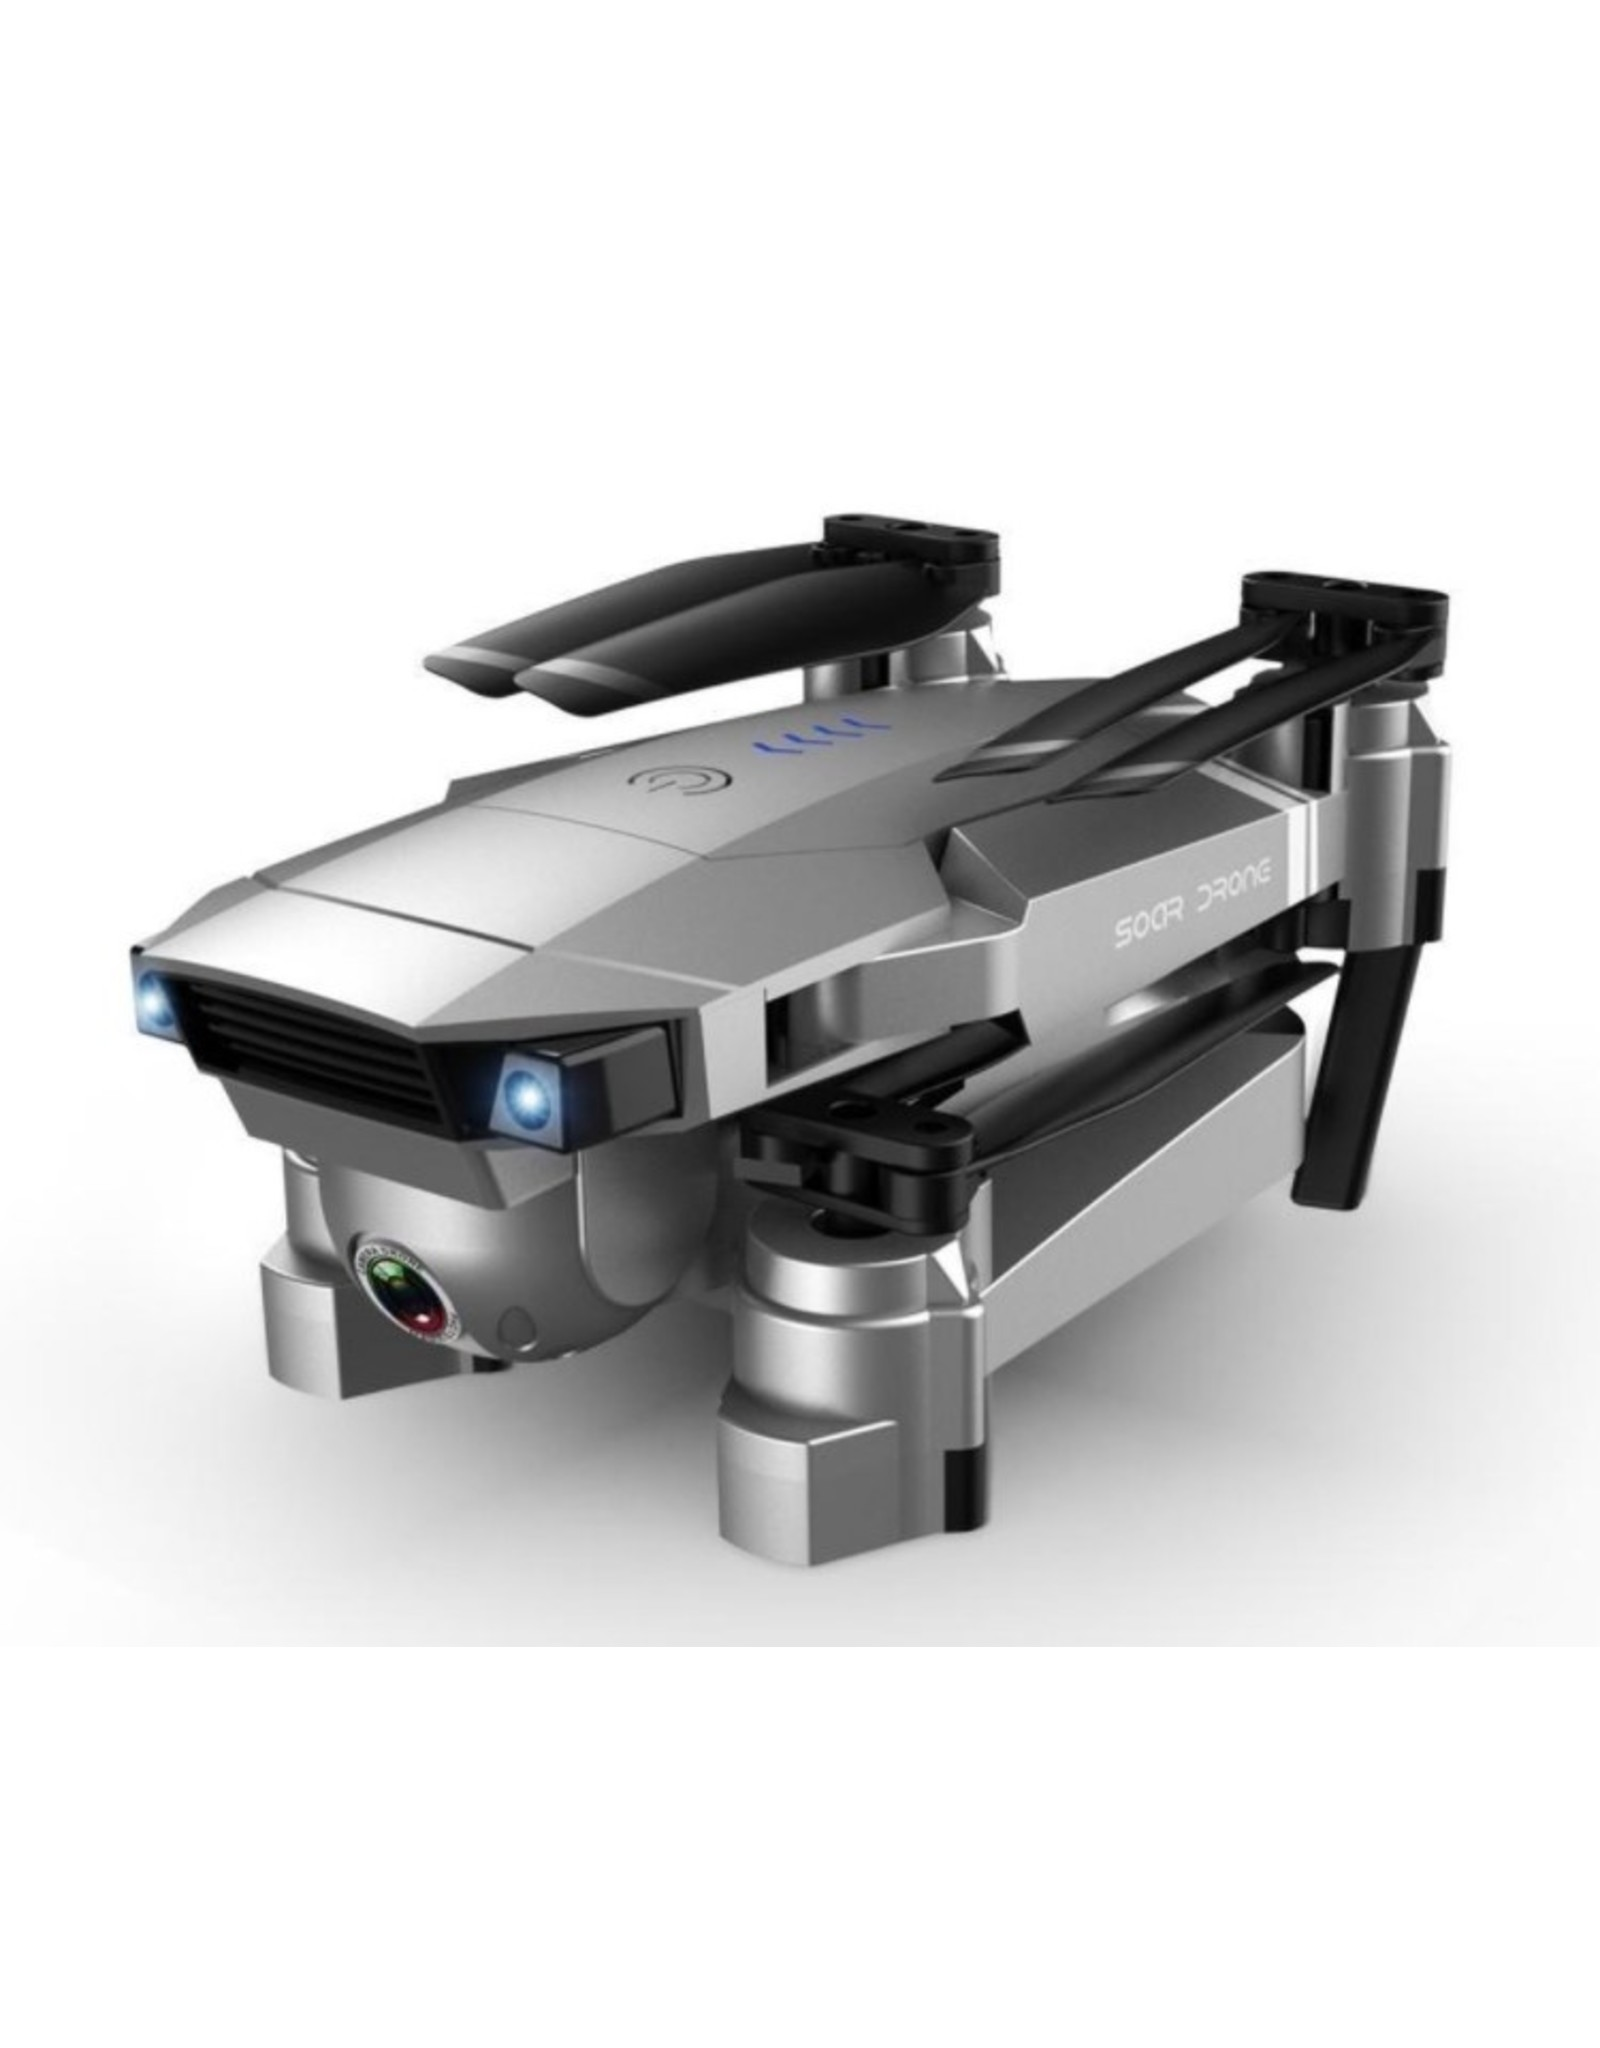 Smart Drone - SG907 - 4K Dual Camera Wide Angle